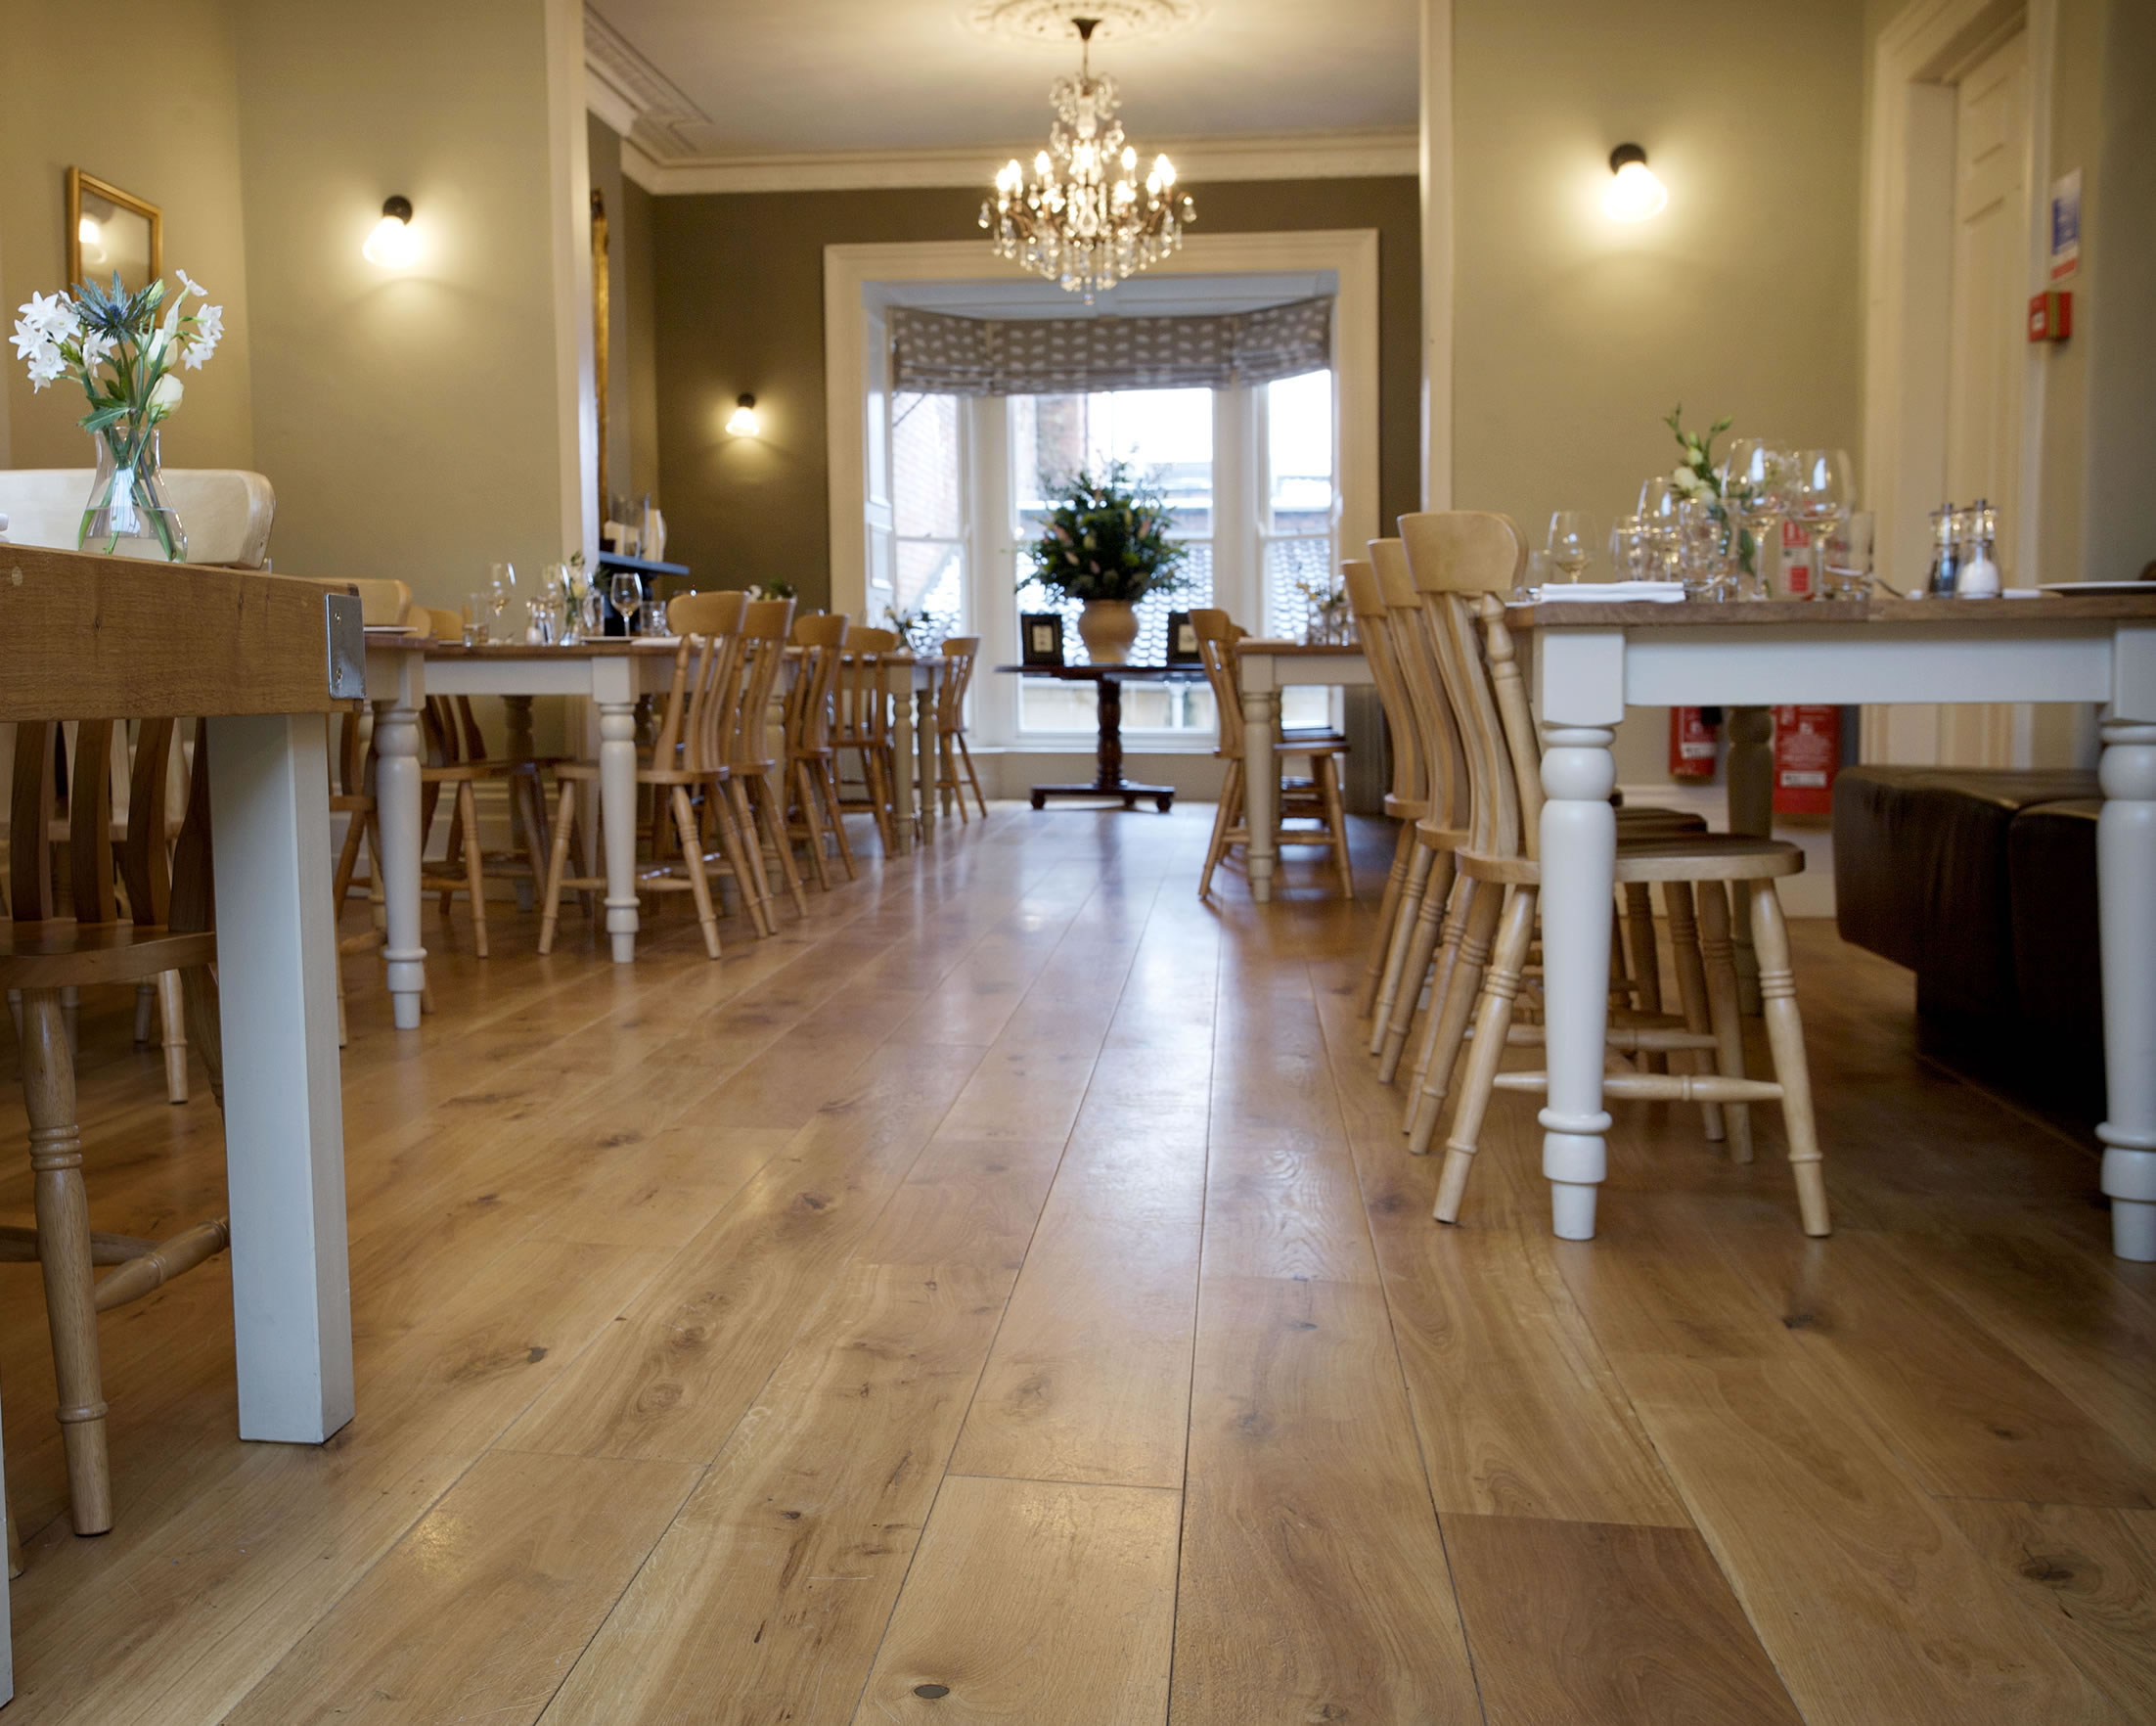 Chauncey S Timber Flooring Ltd